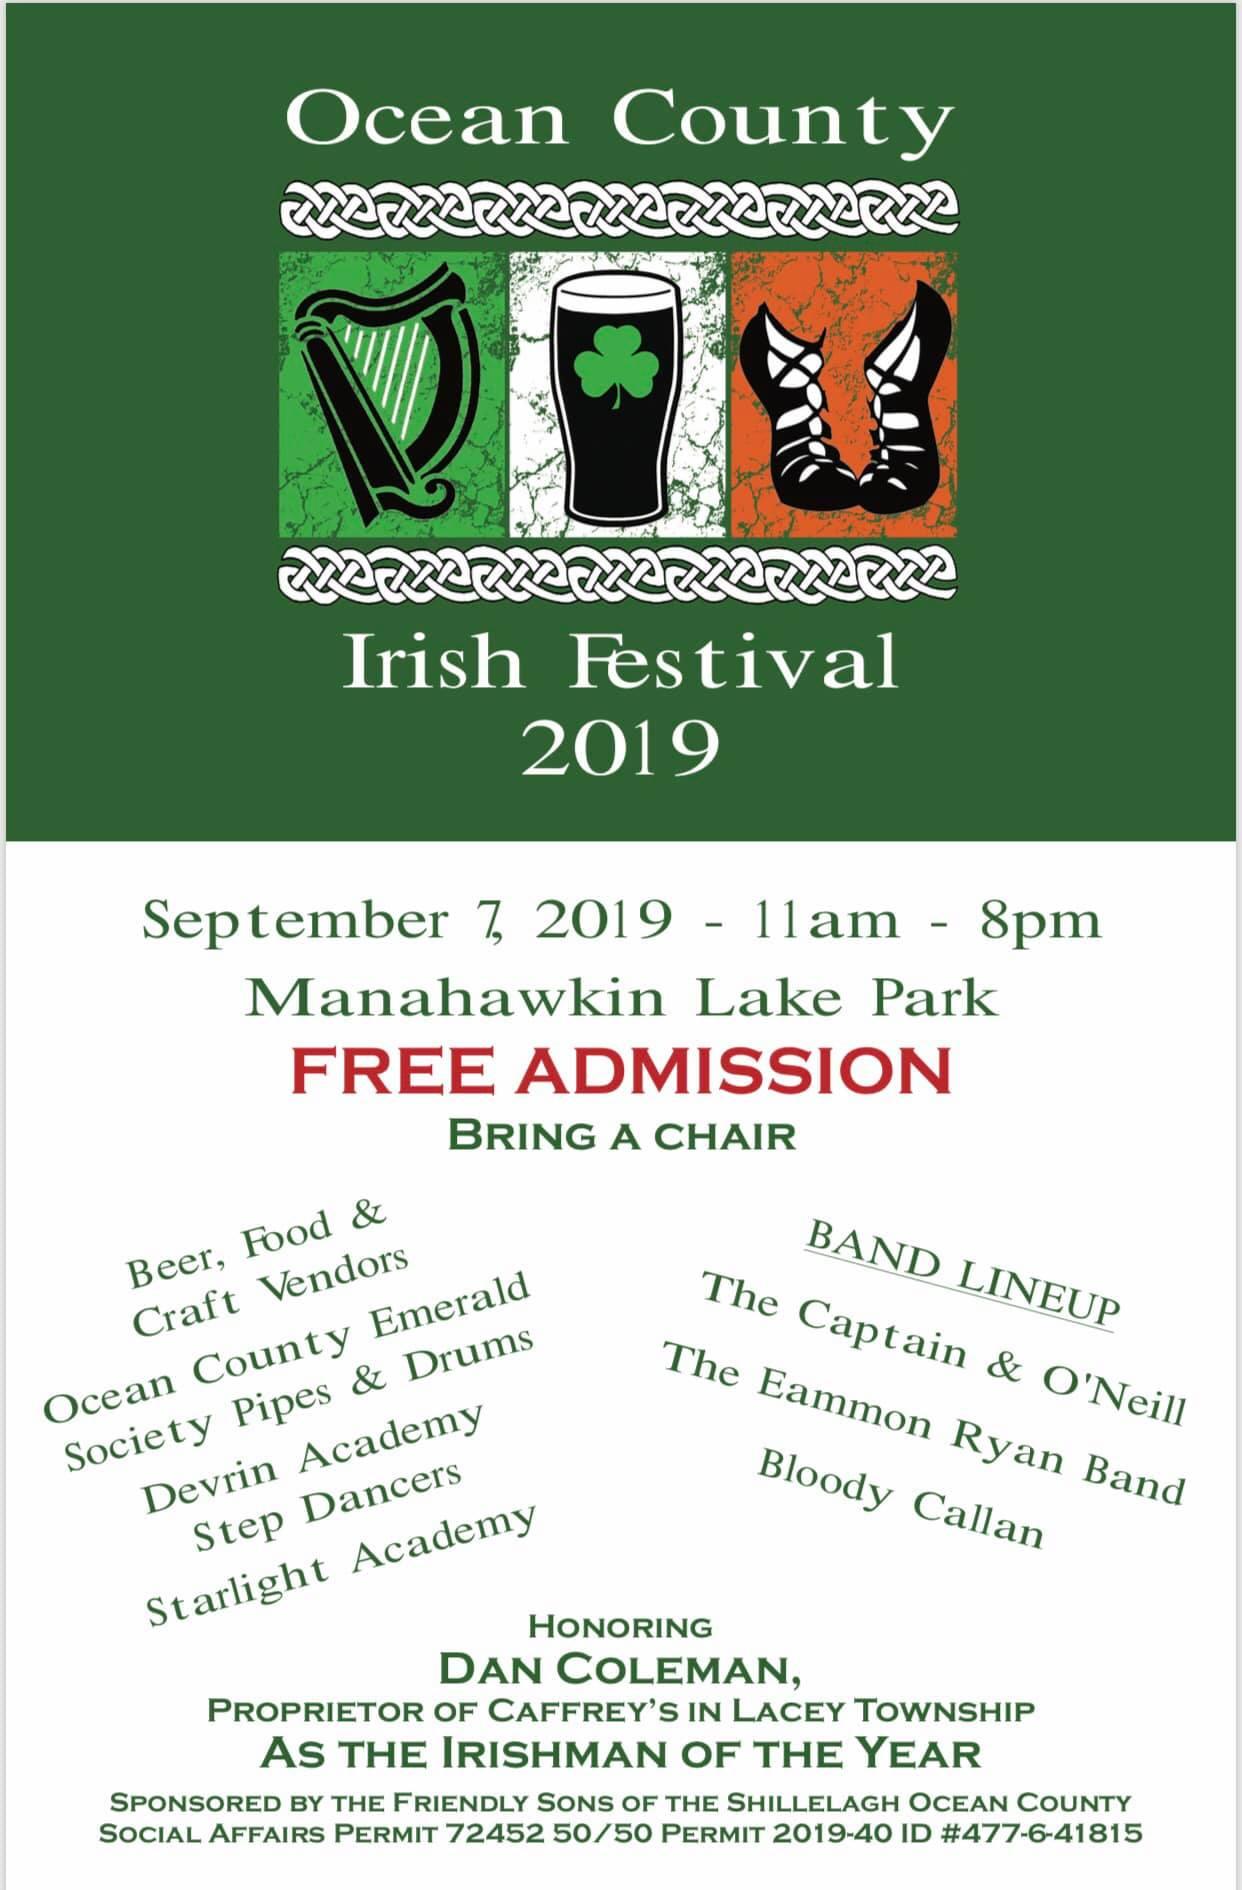 The Ocean County Irish Festival is Saturday at Manahawkin